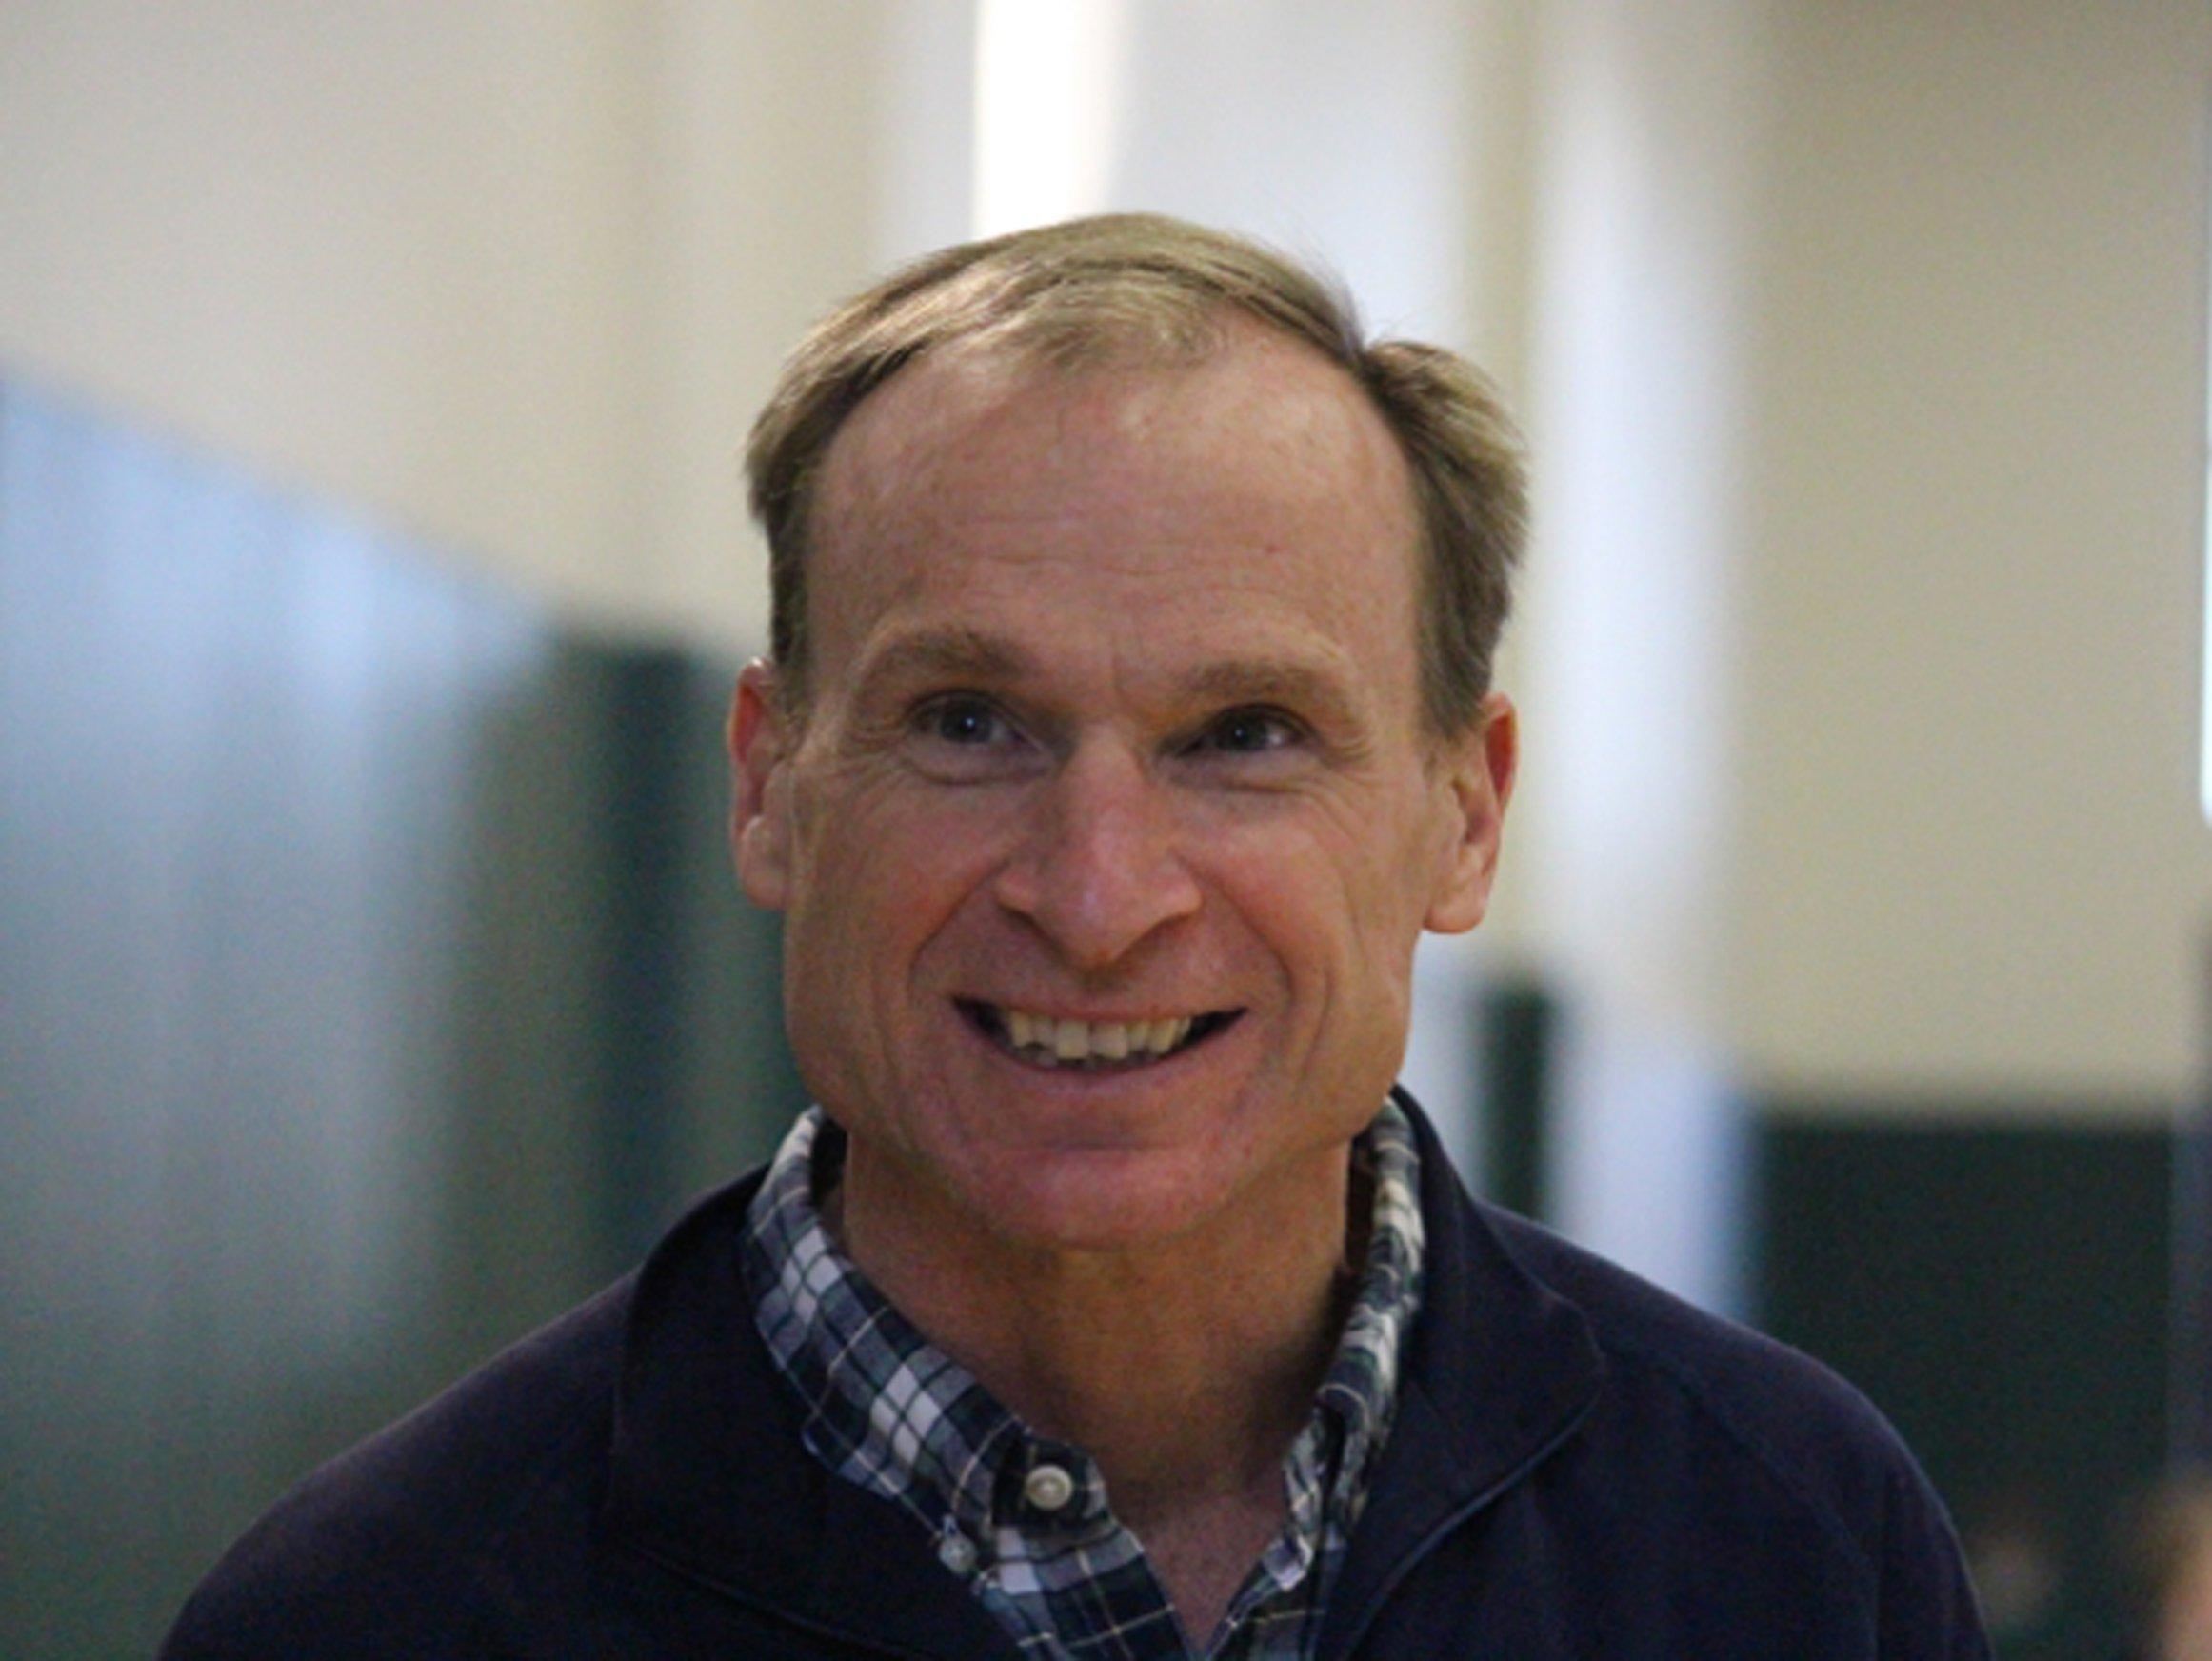 Paul Oyer, economista da universidade de Stanford